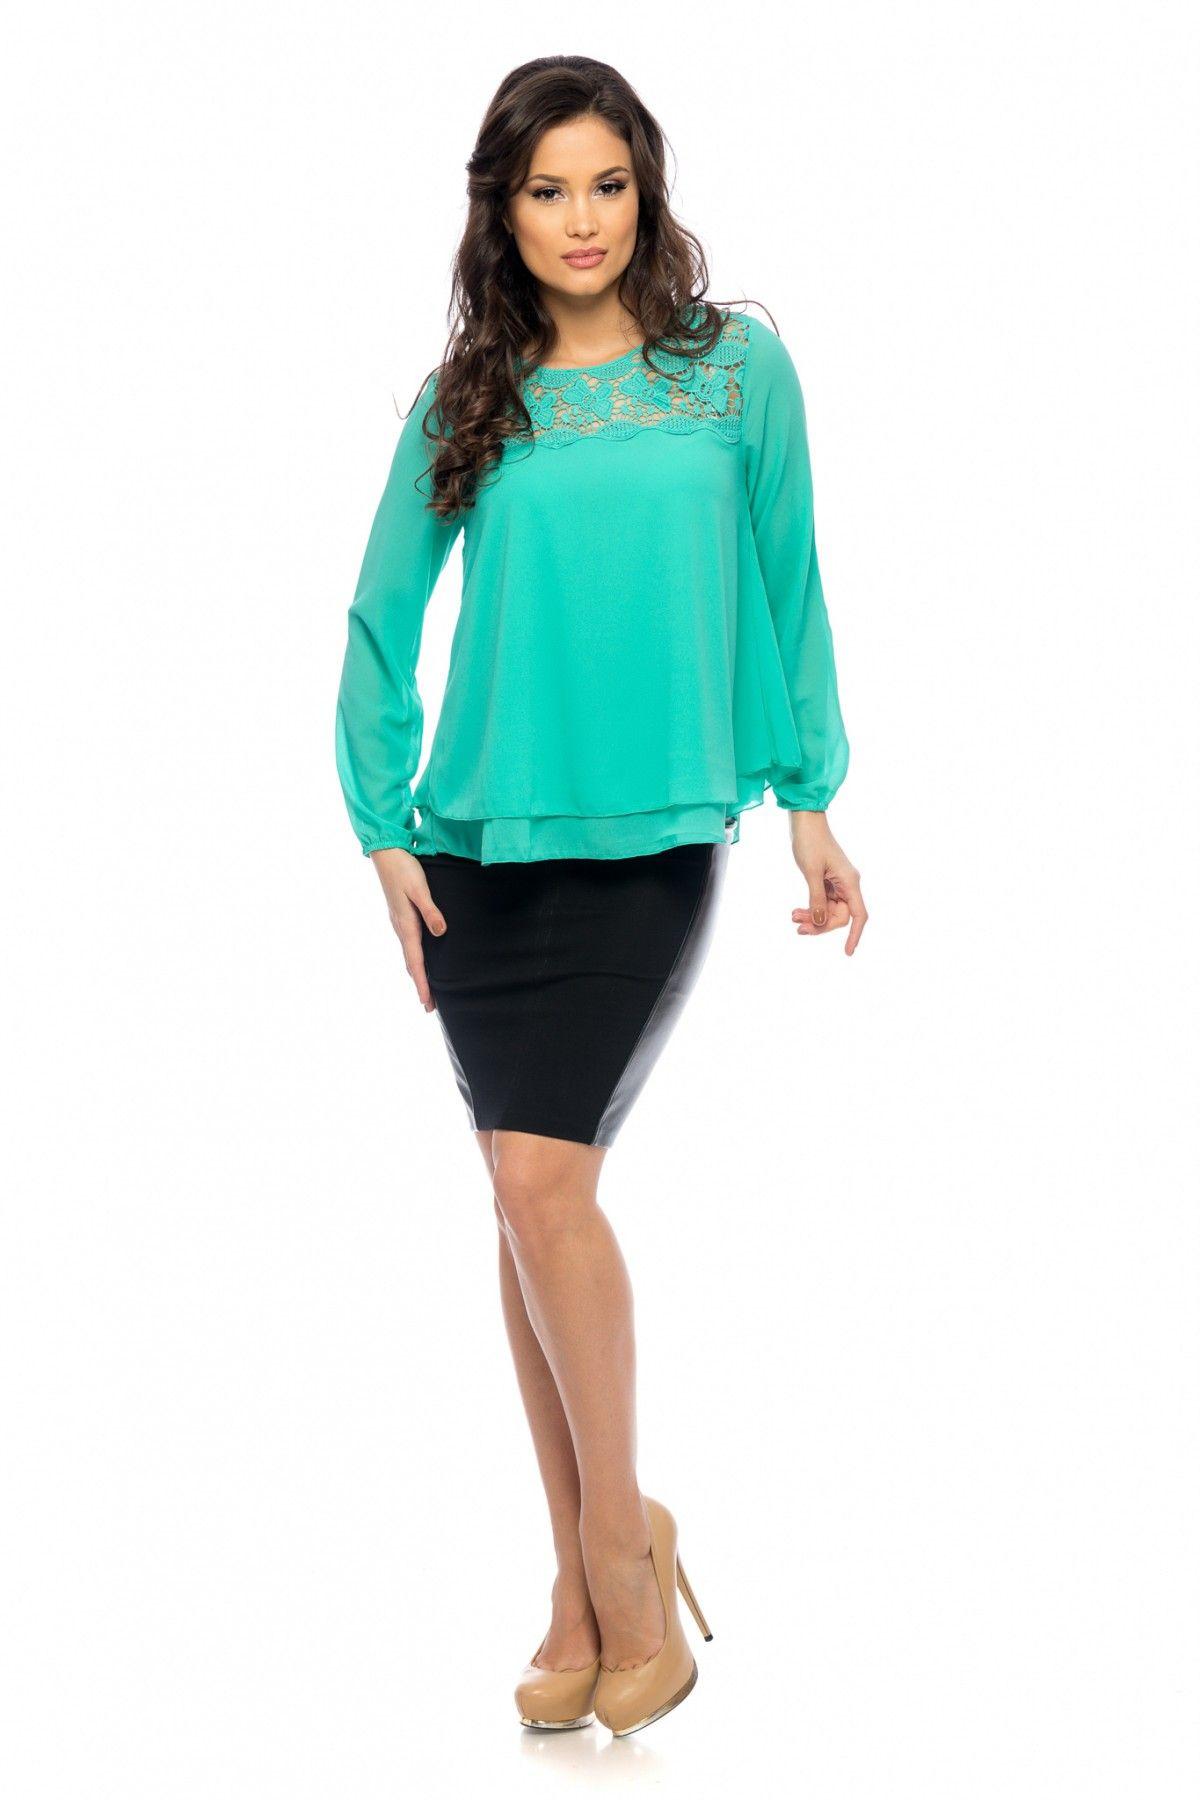 Bluza Lisa Vernil 109 lei Bluza eleganta din voal